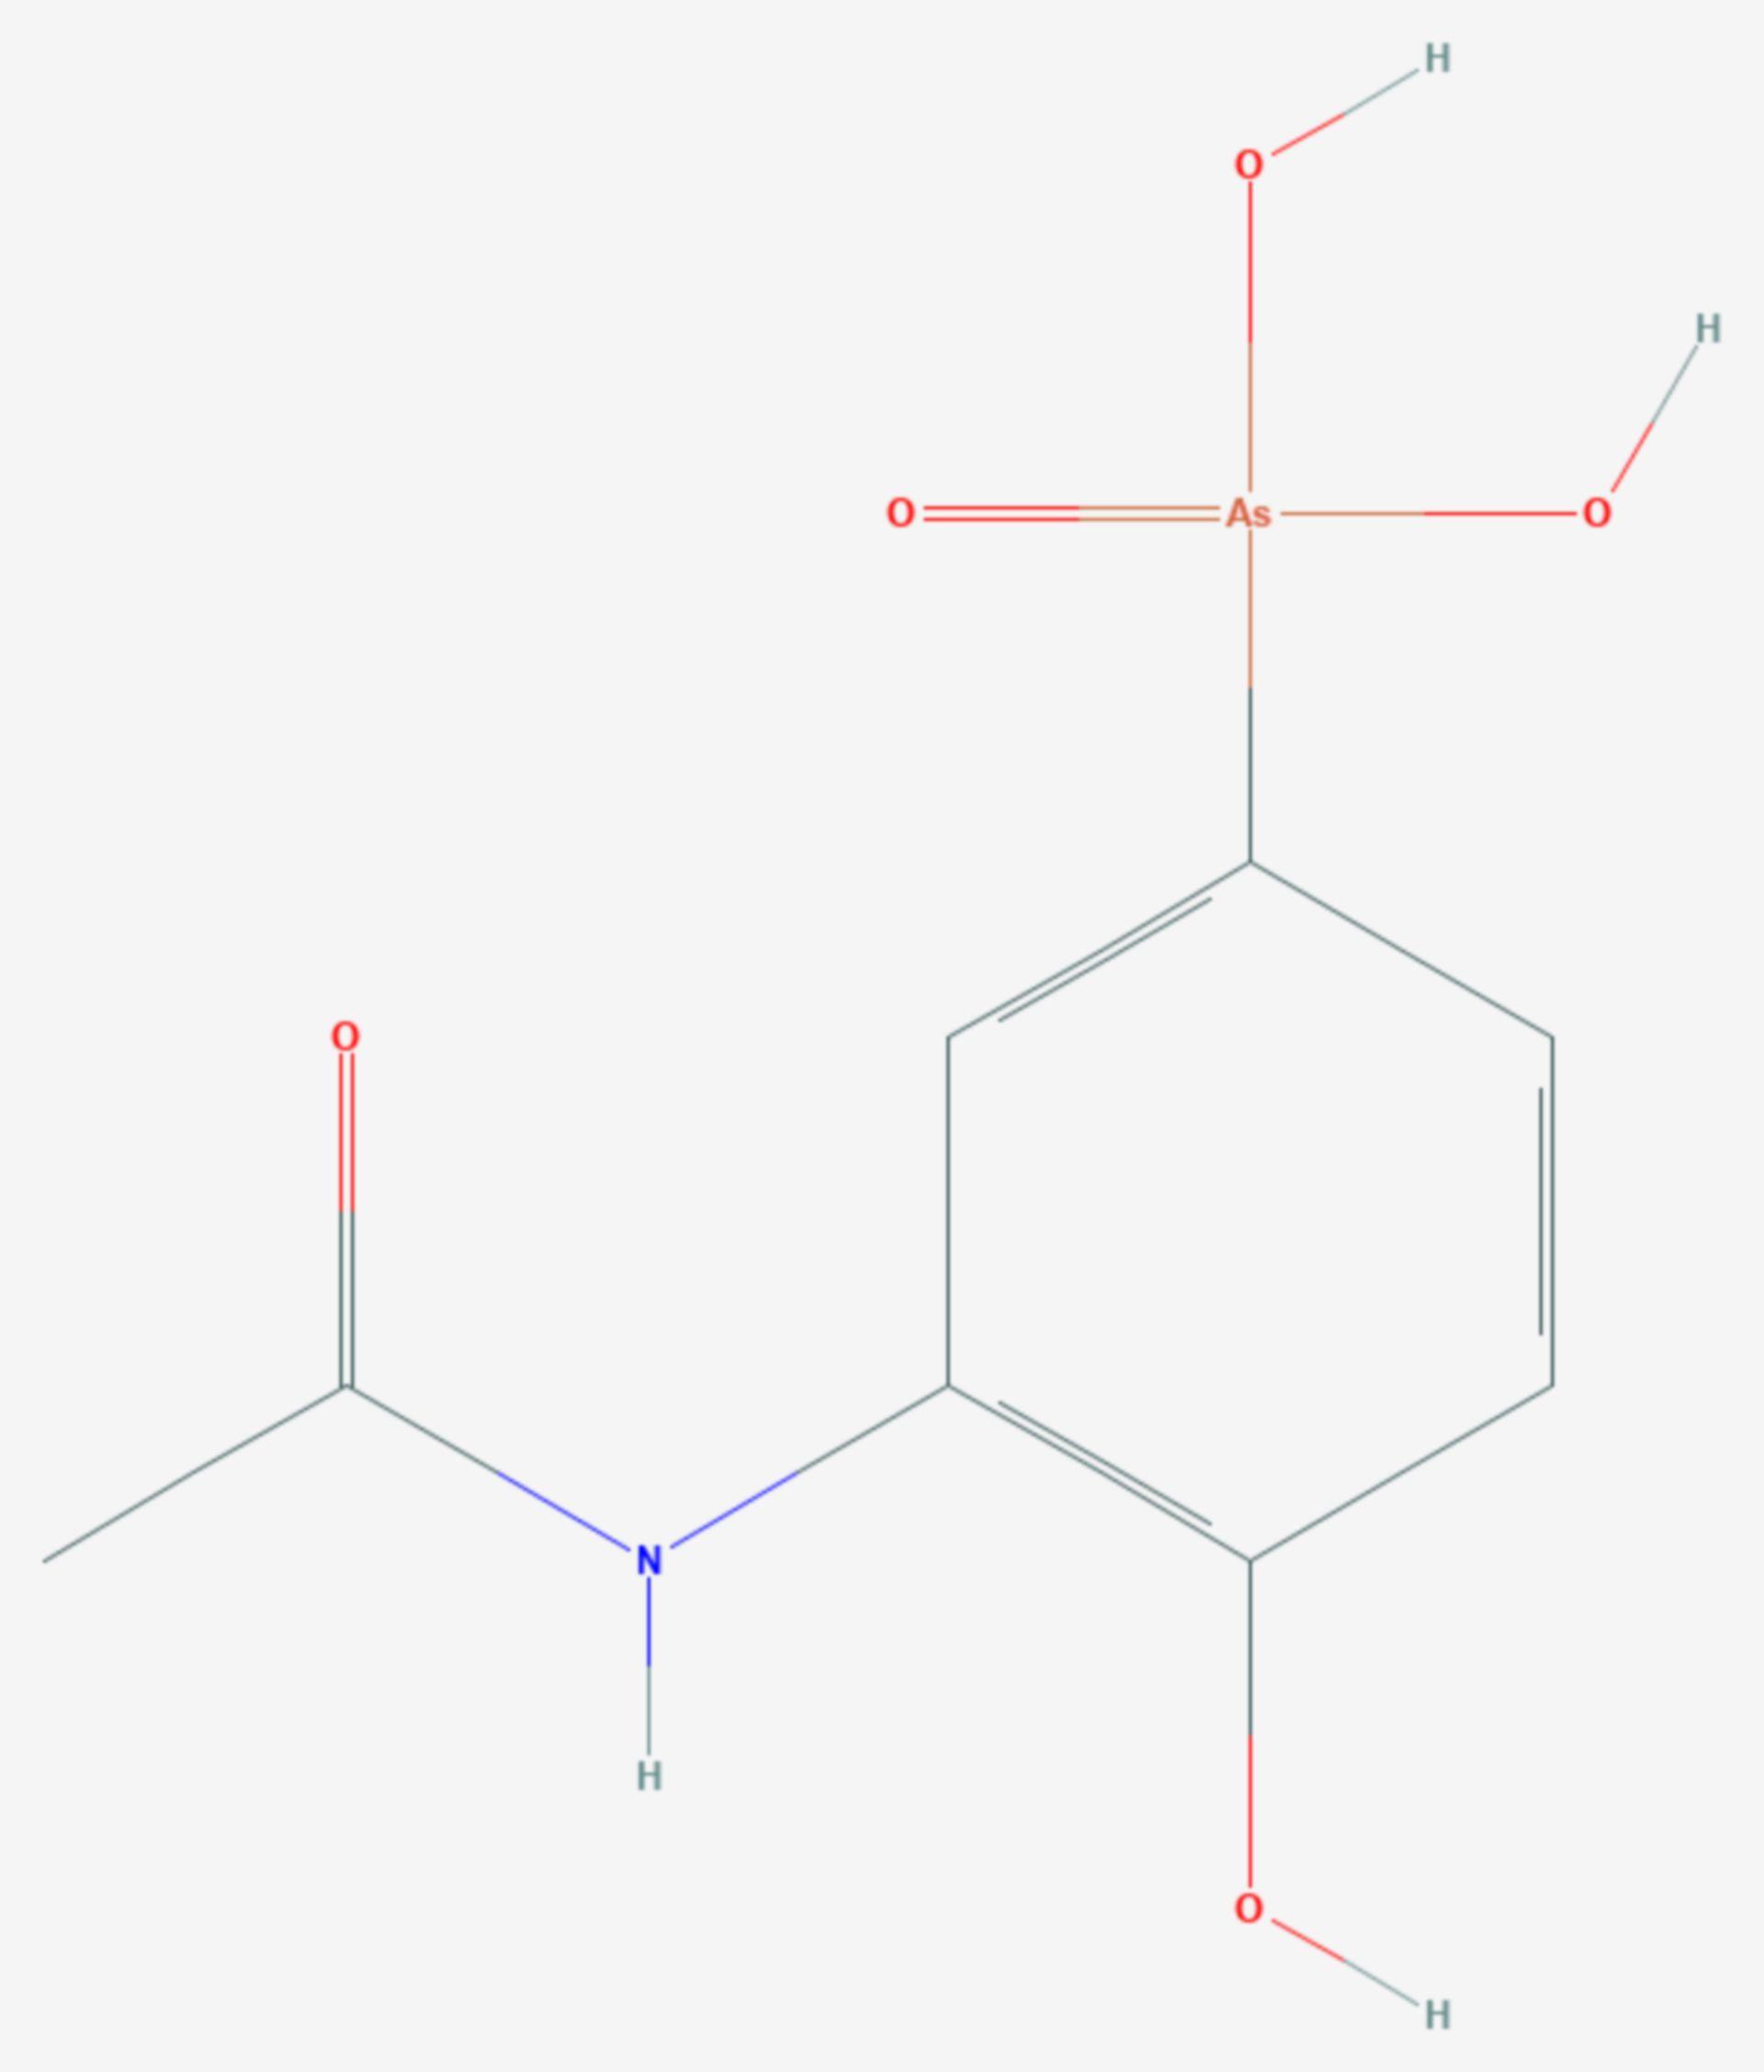 Acetarsol (Strukturformel)